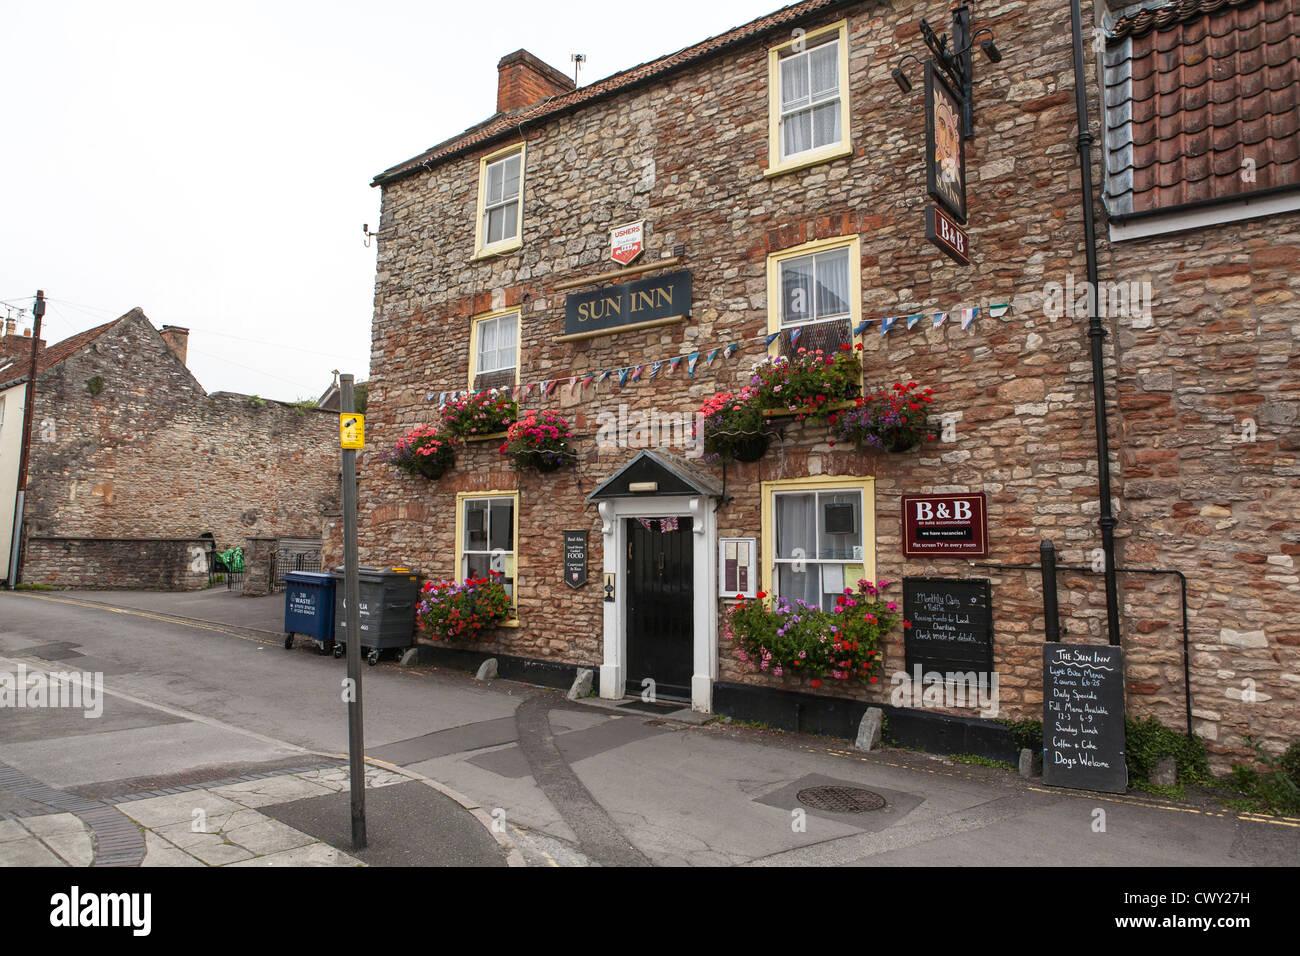 The Sun Inn pub and b&b, Wells, Somerset. - Stock Image